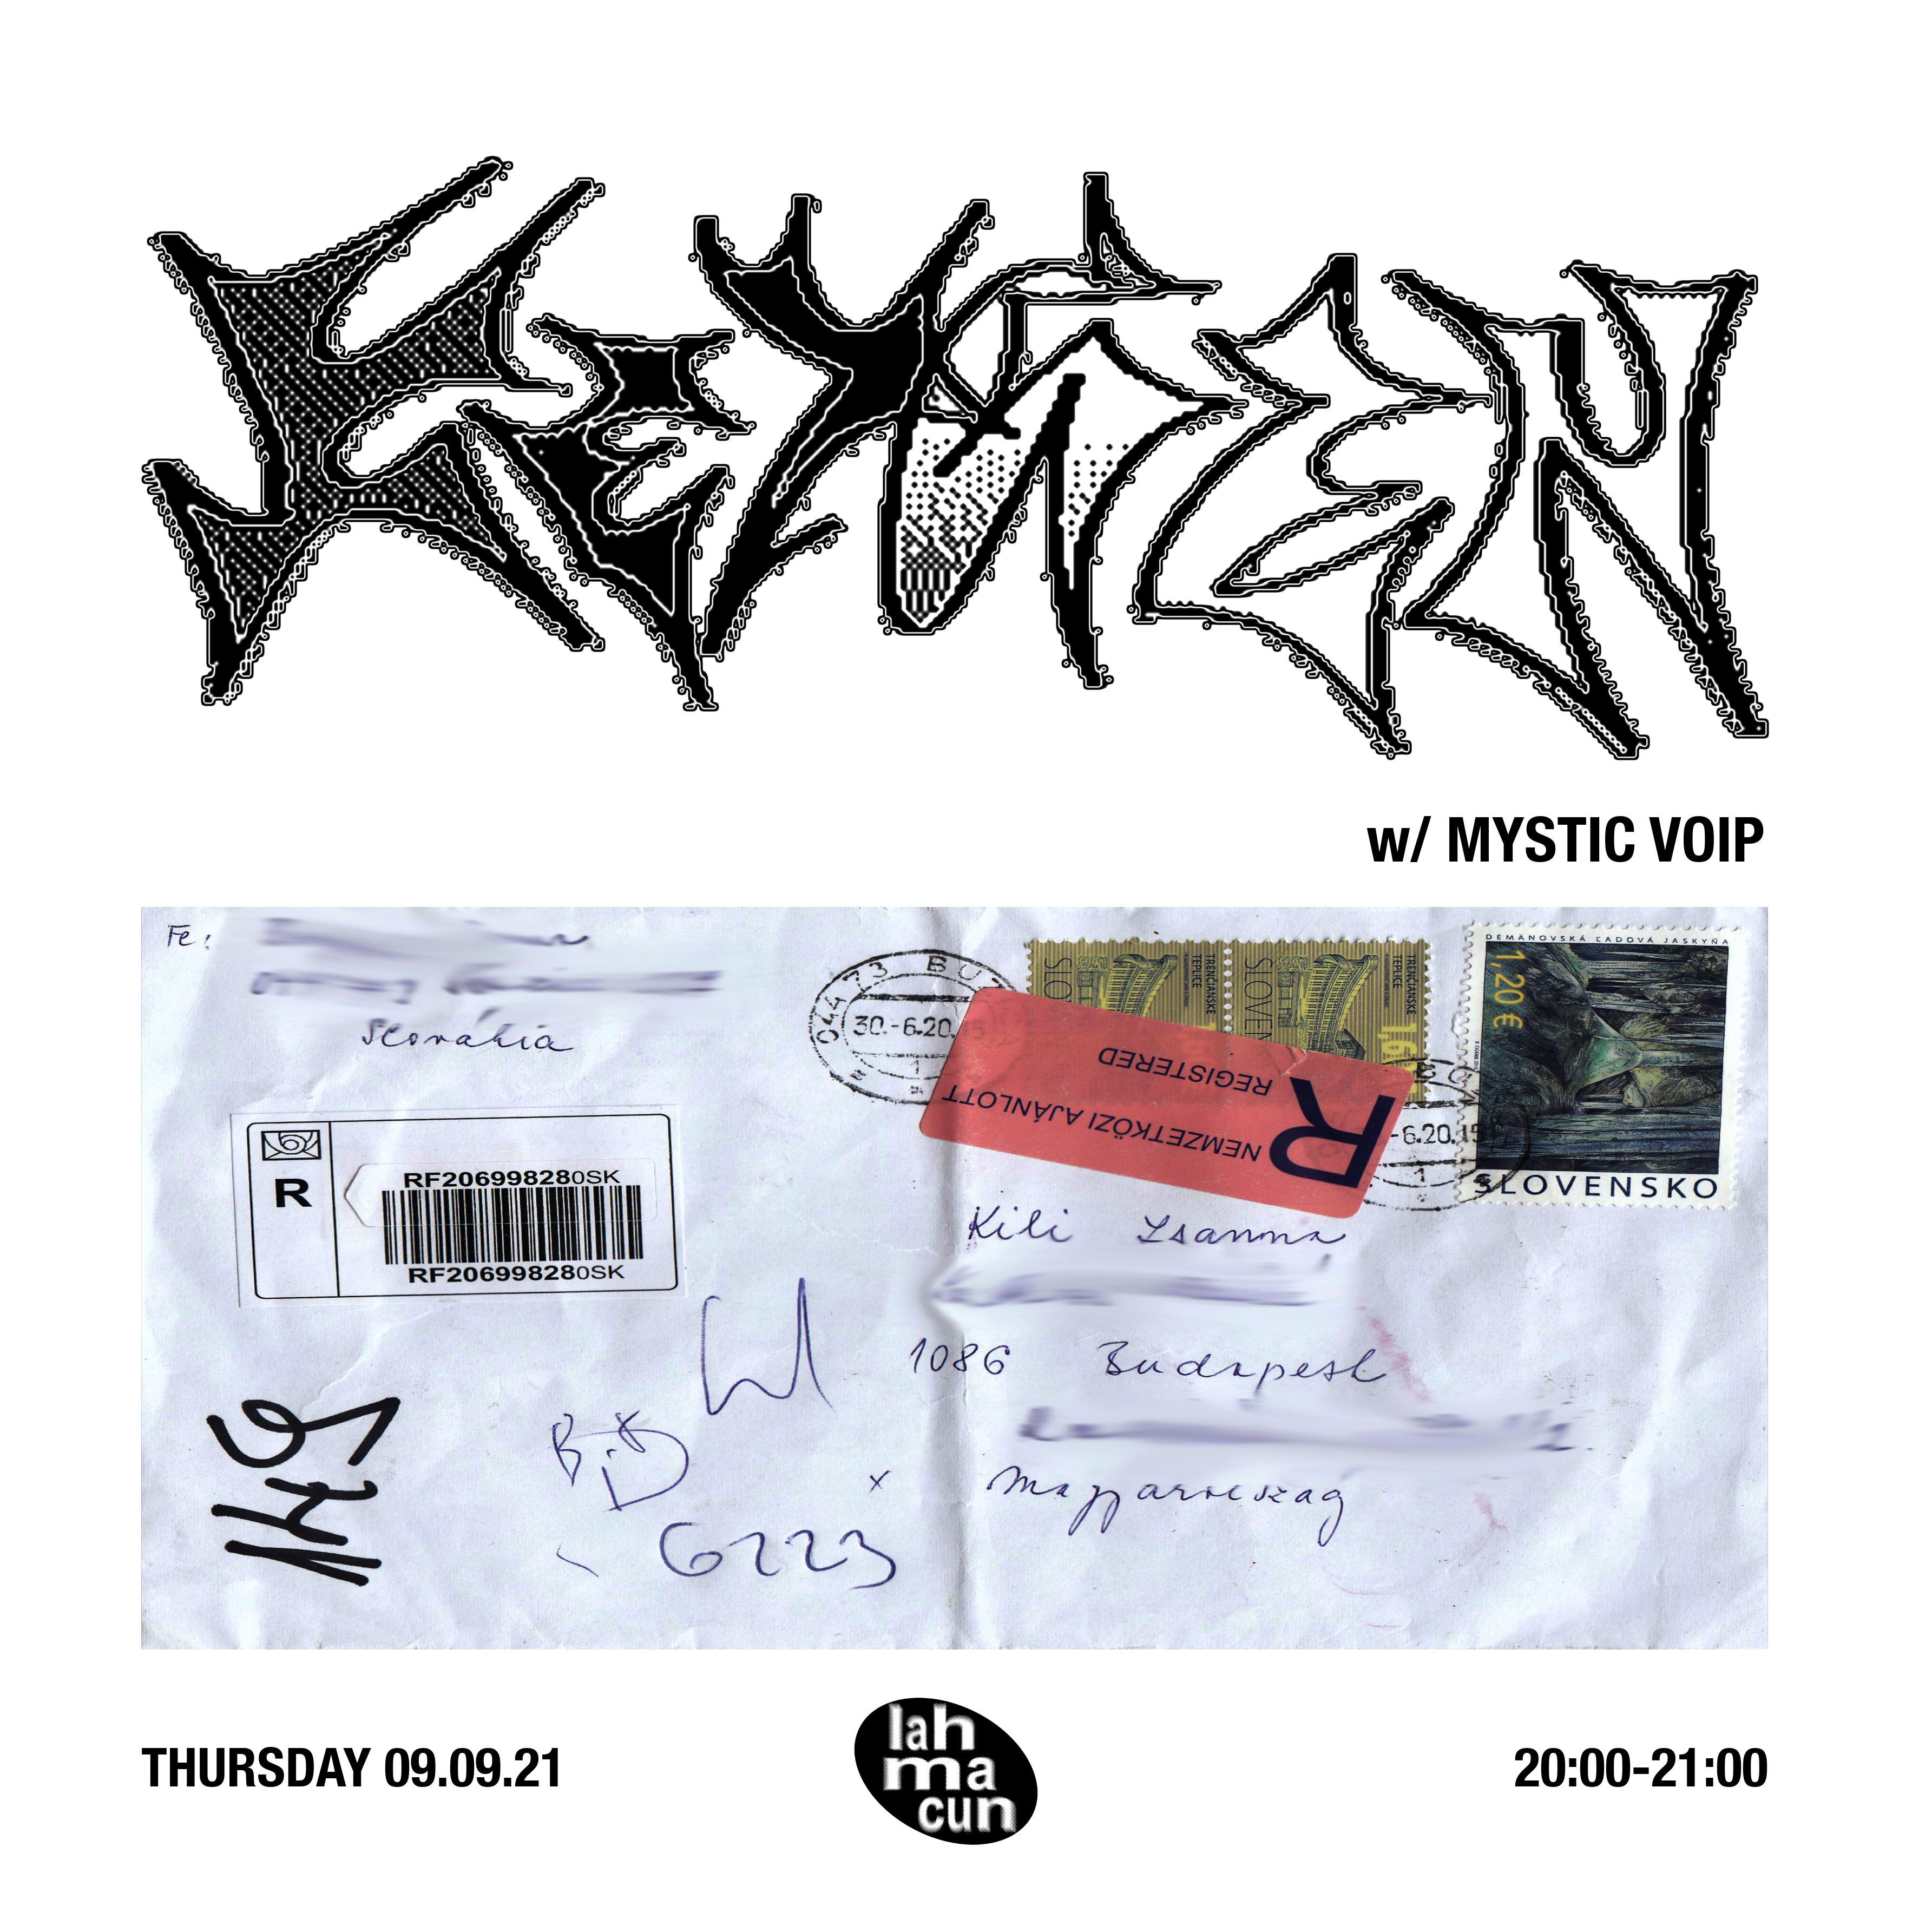 EP4 - MYSTIC VOIP